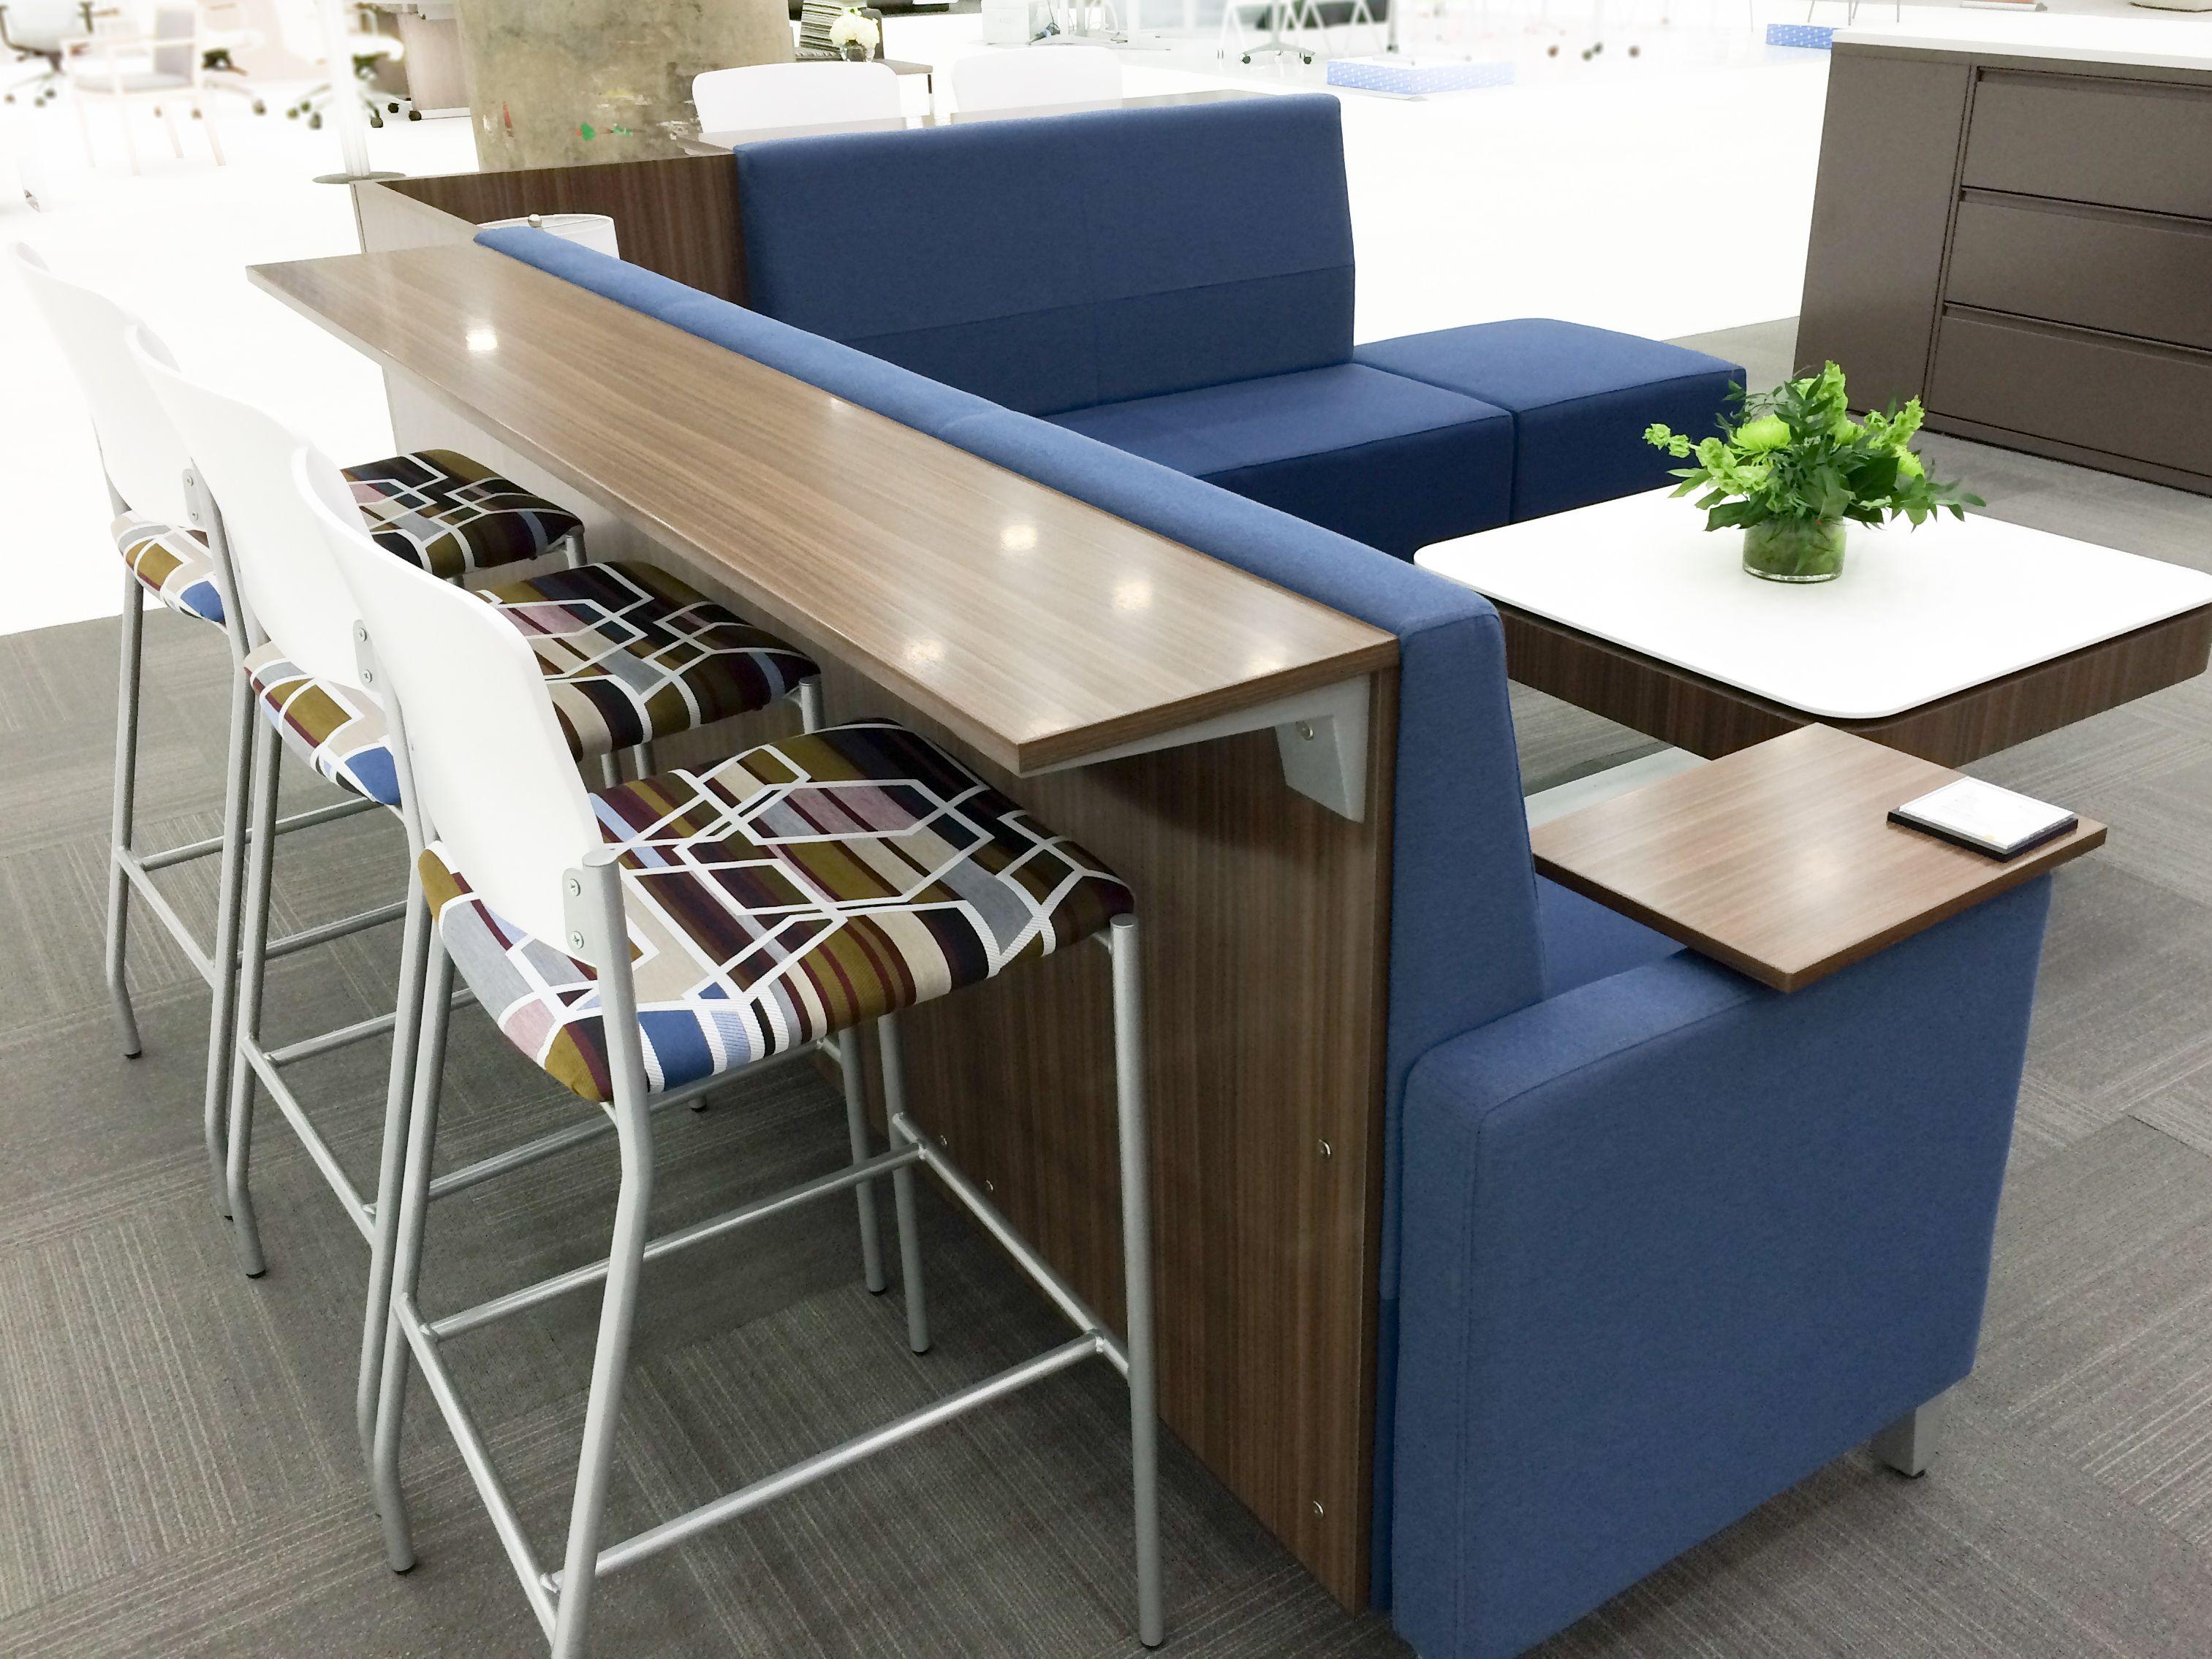 www.myresourcelibrary.com NATIONAL | Outdoor furniture ...